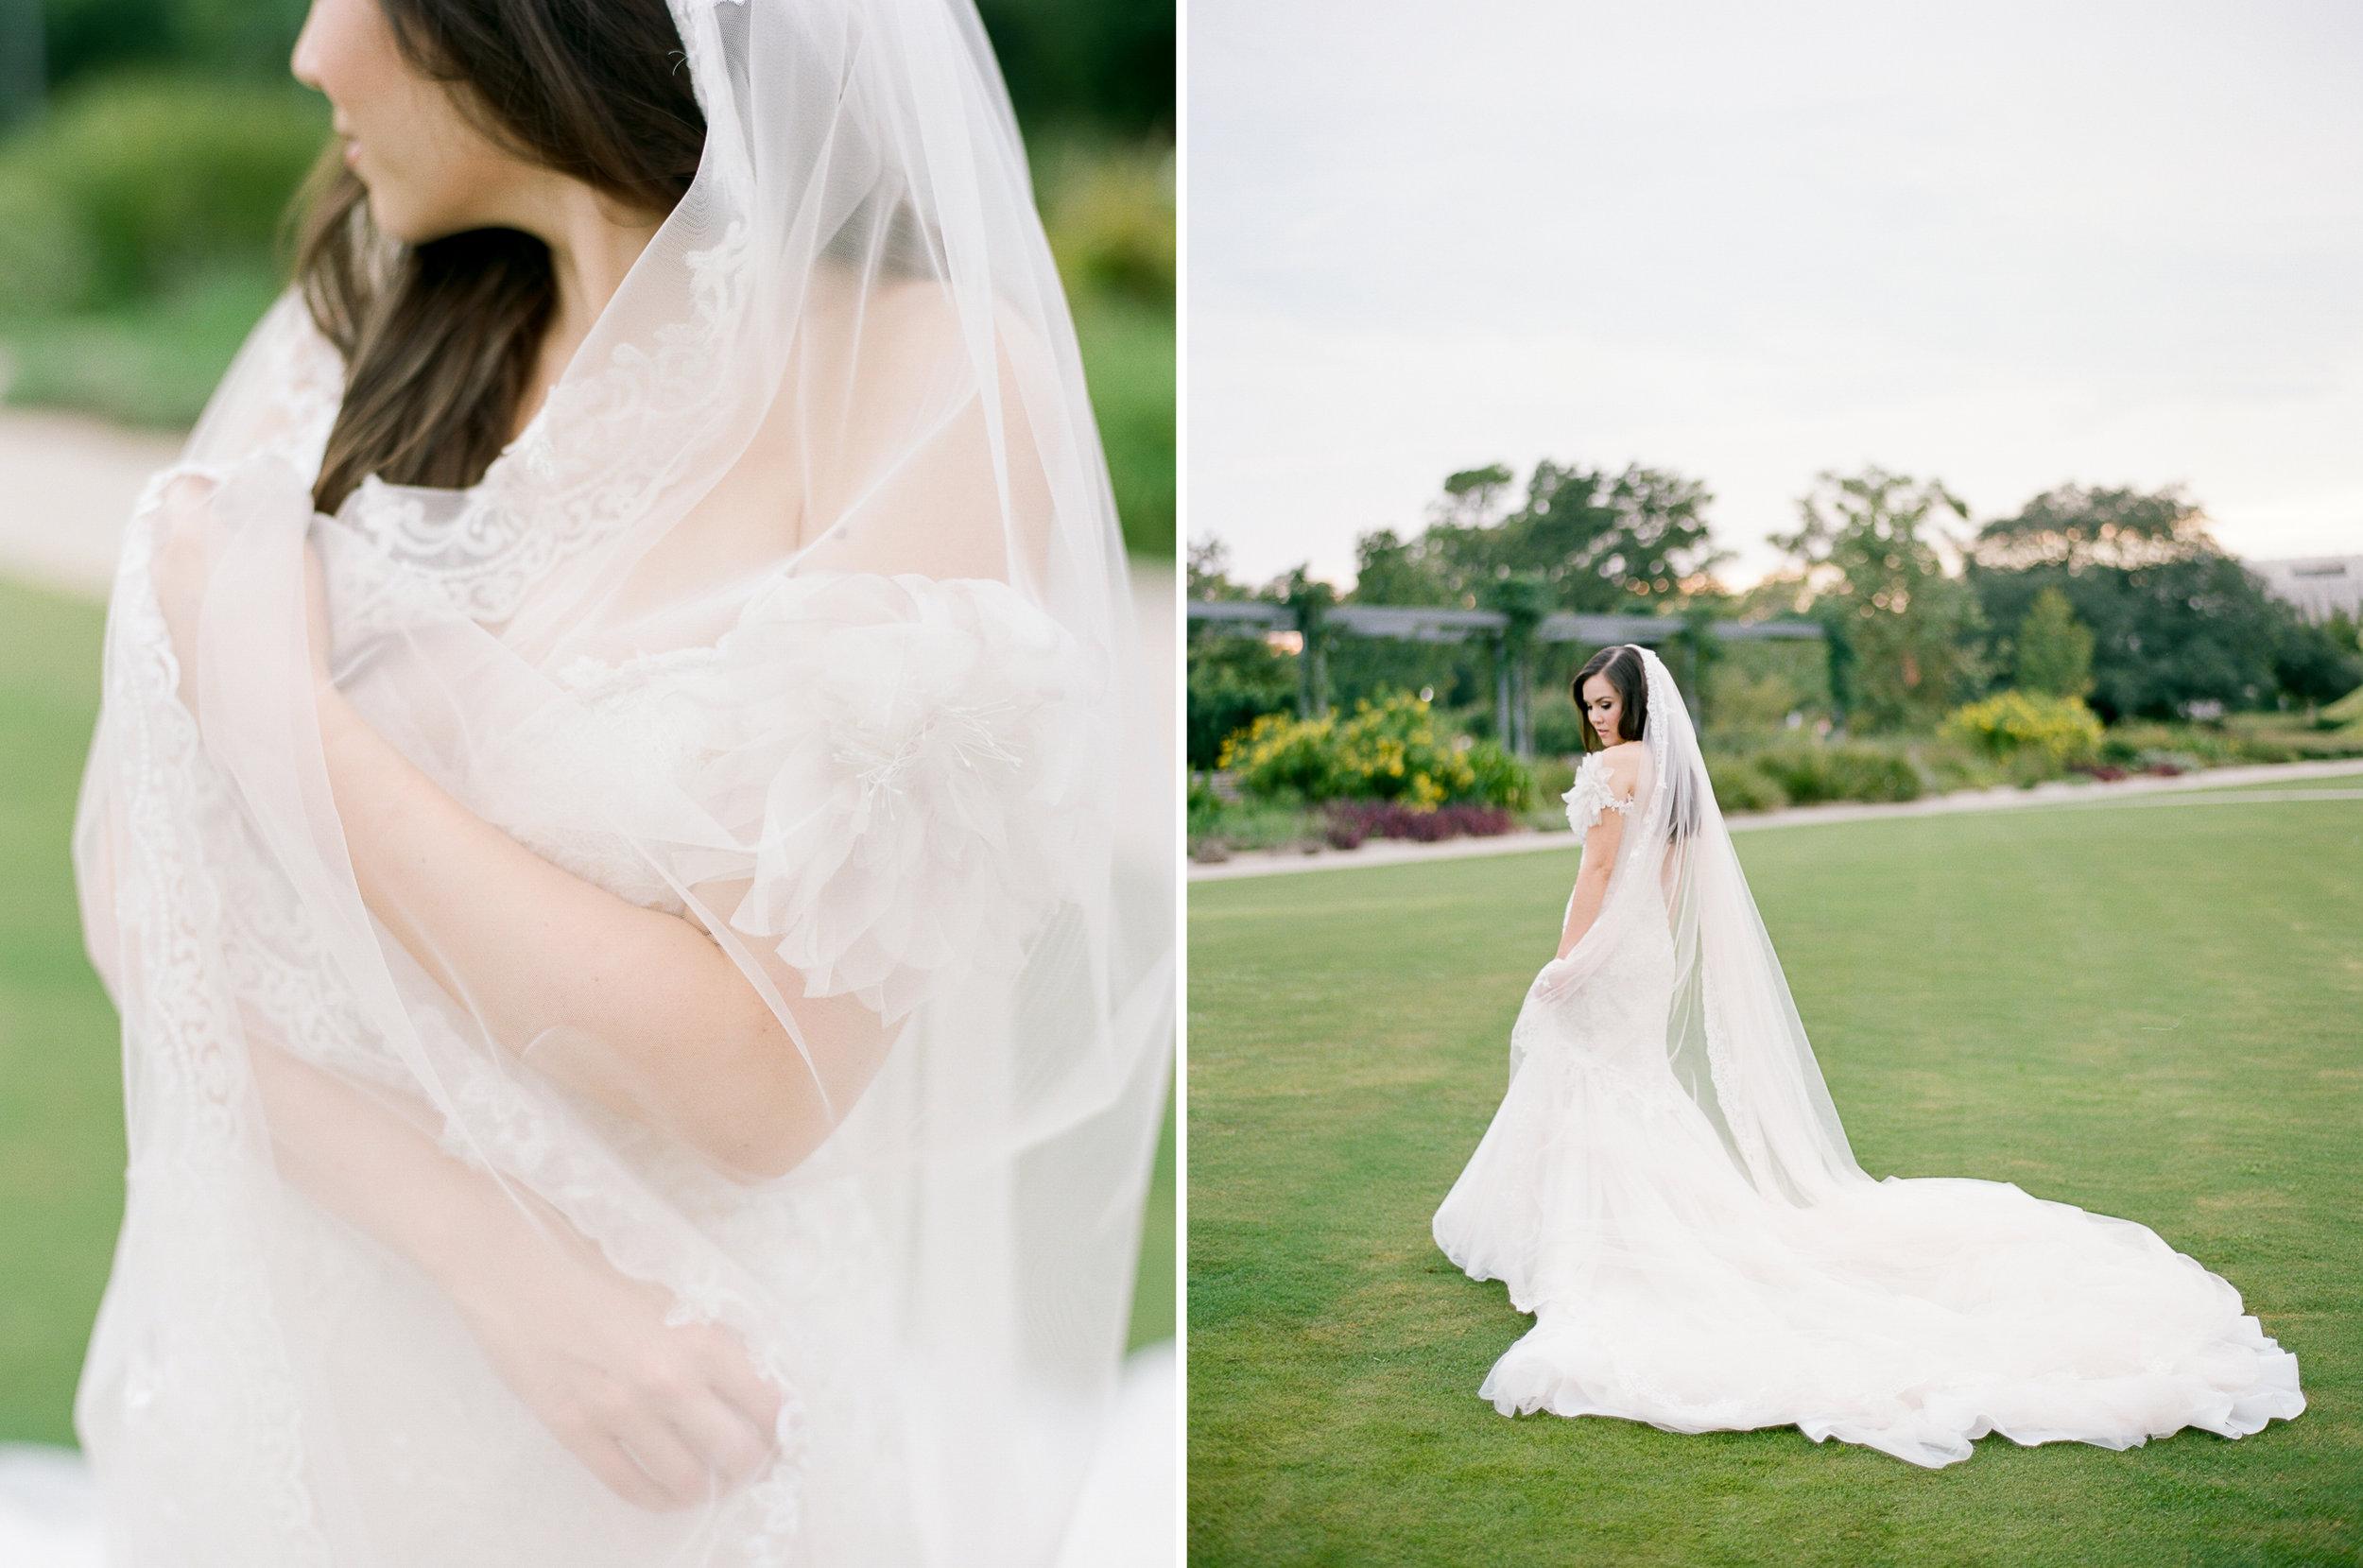 Fine-Art-Film-Houston-Wedding-Photographer-Best-Top-Luxury-Texas-Austin-Dallas-Destination-Dana-Fernandez-Photography-Portrait-Bridals-McGovern-Centennial-Gardens-109.jpg